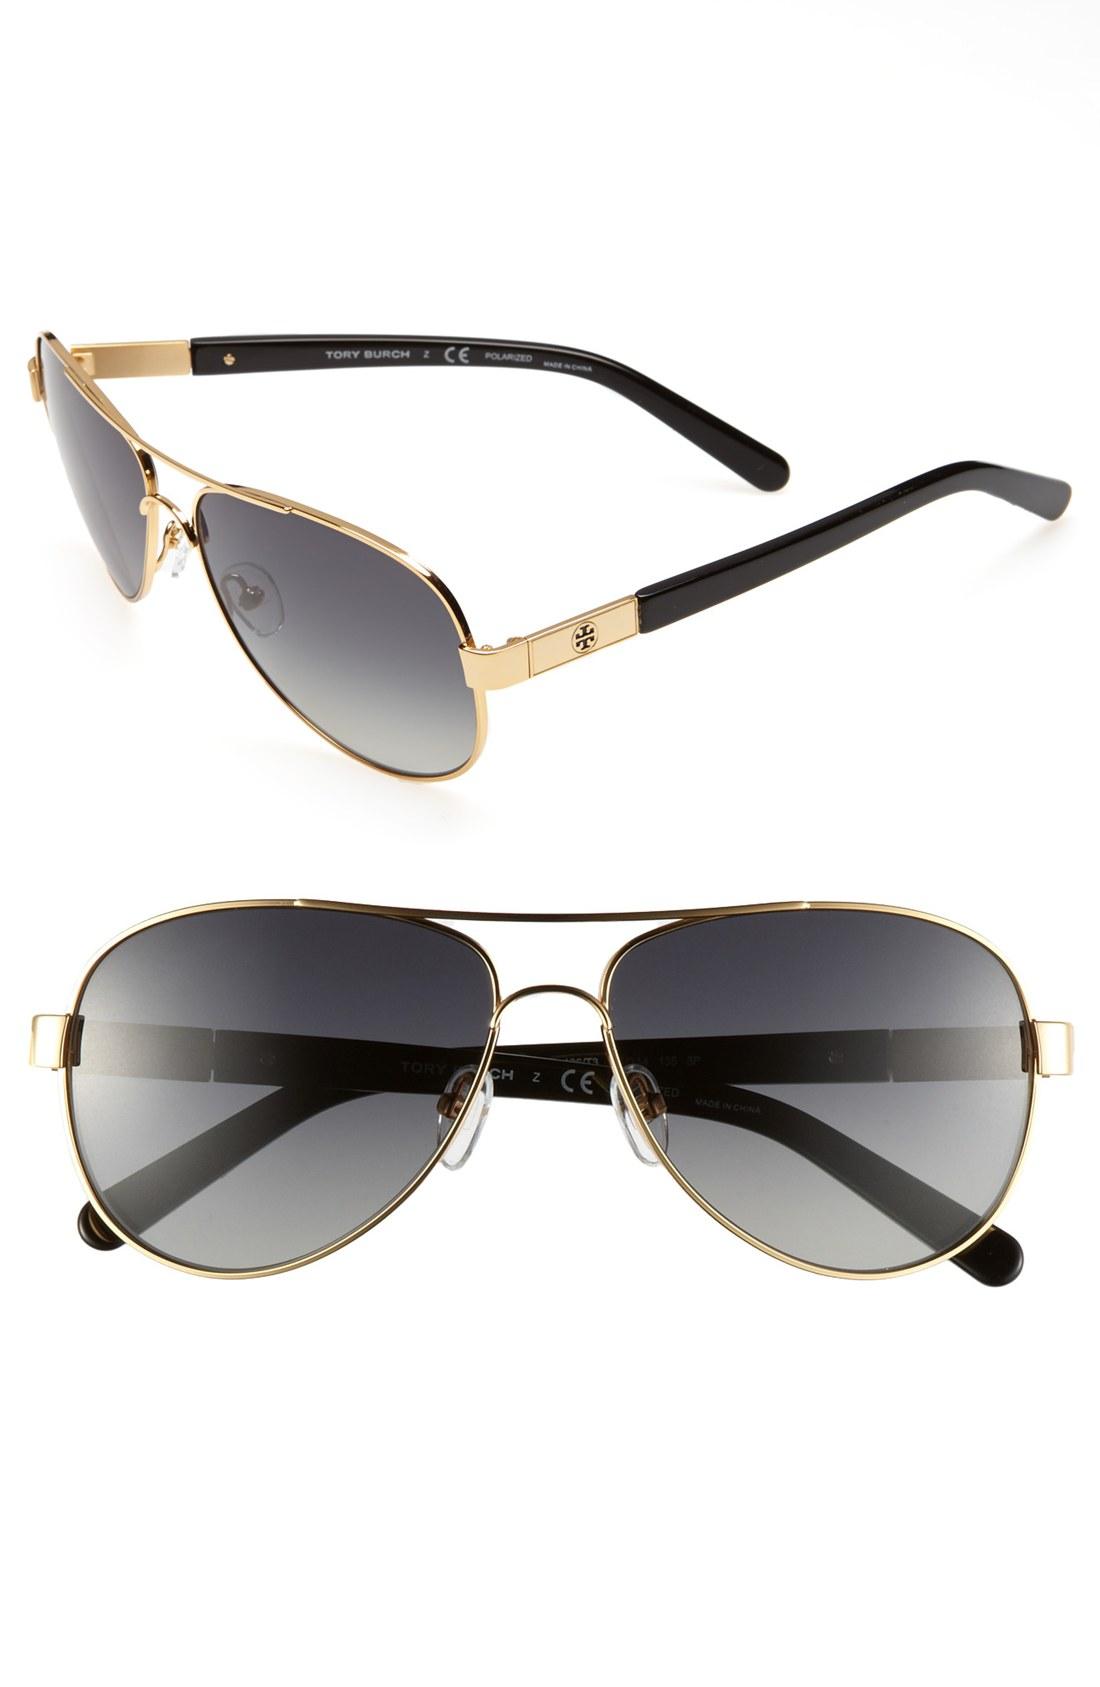 Tory Burch Polarized Cat Eye Sunglasses